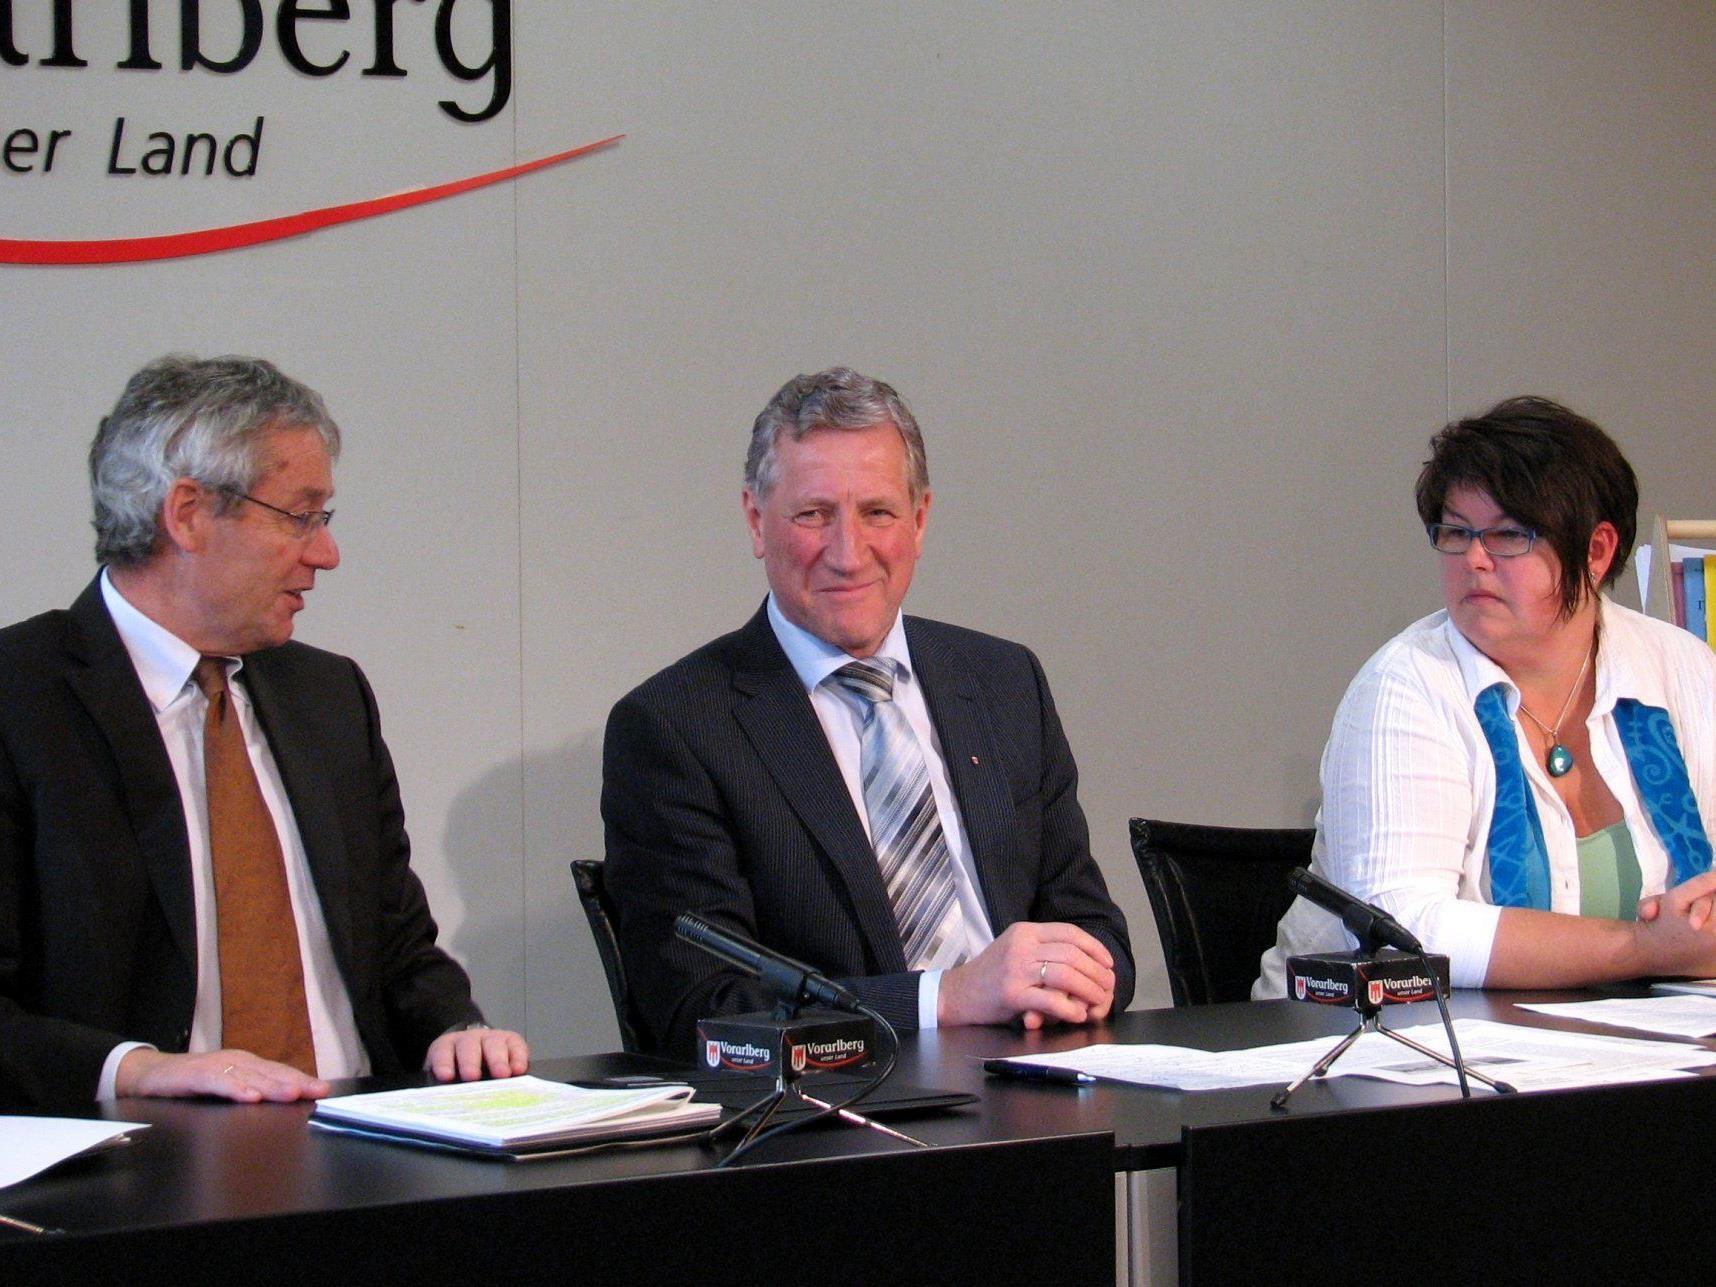 Pressefoyer am 15. Mai: Positive Zwischenbilanz zum Integrationsleitbild präsentiert.